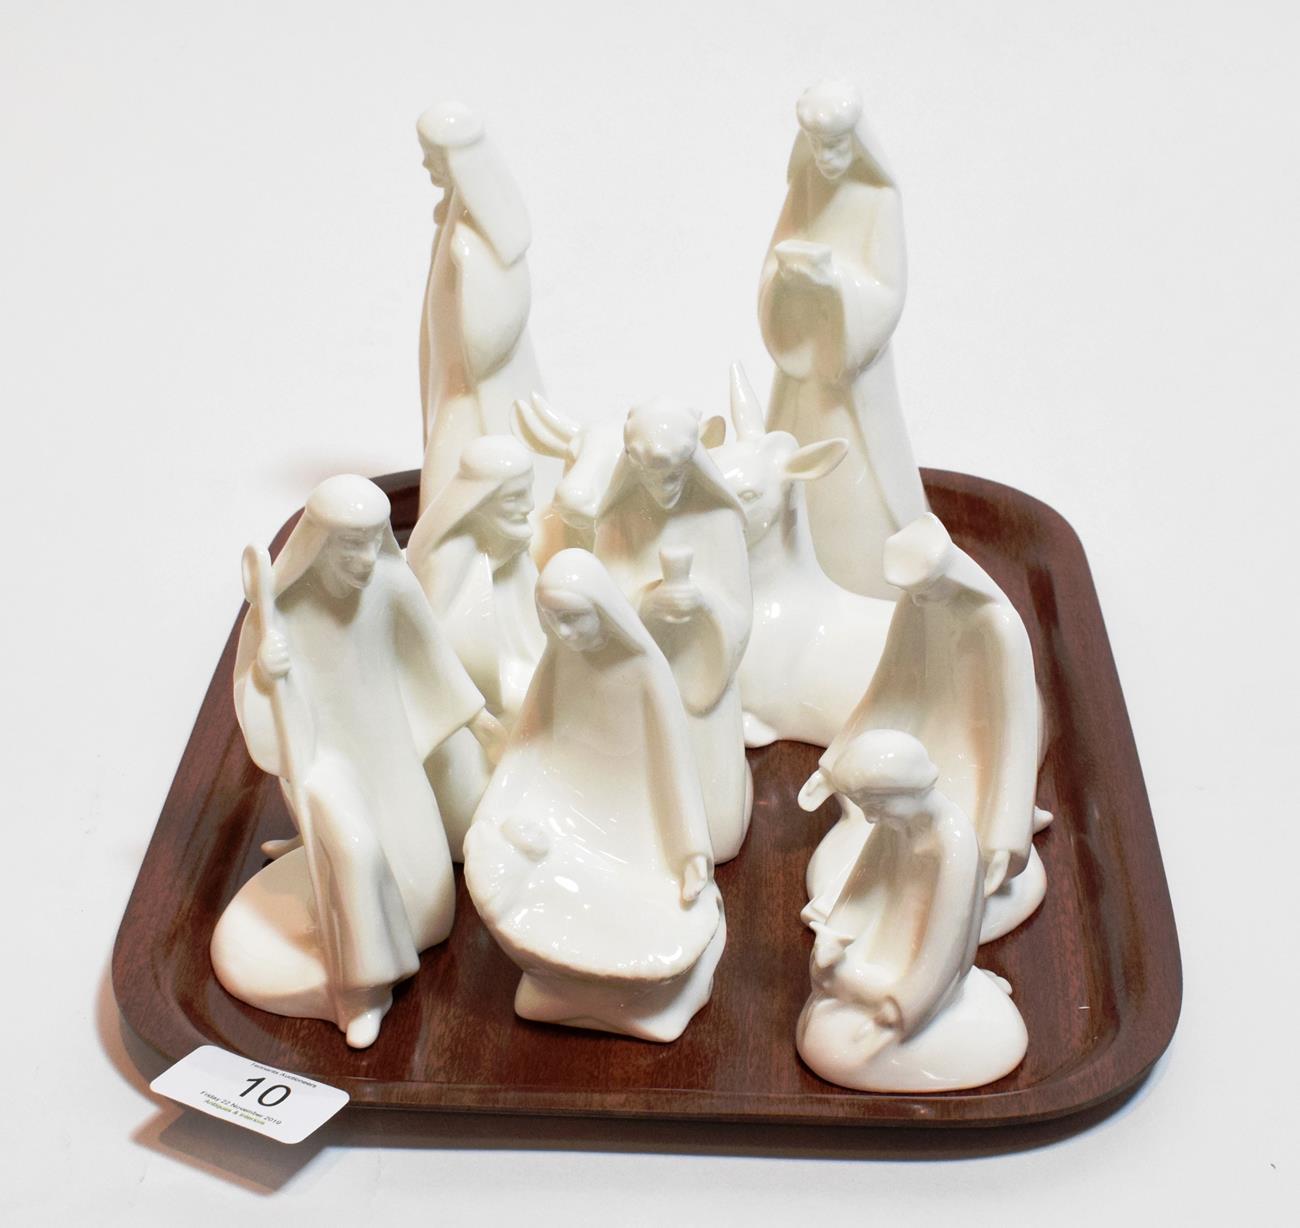 Lot 10 - A Royal Doulton nativity set (boxed)